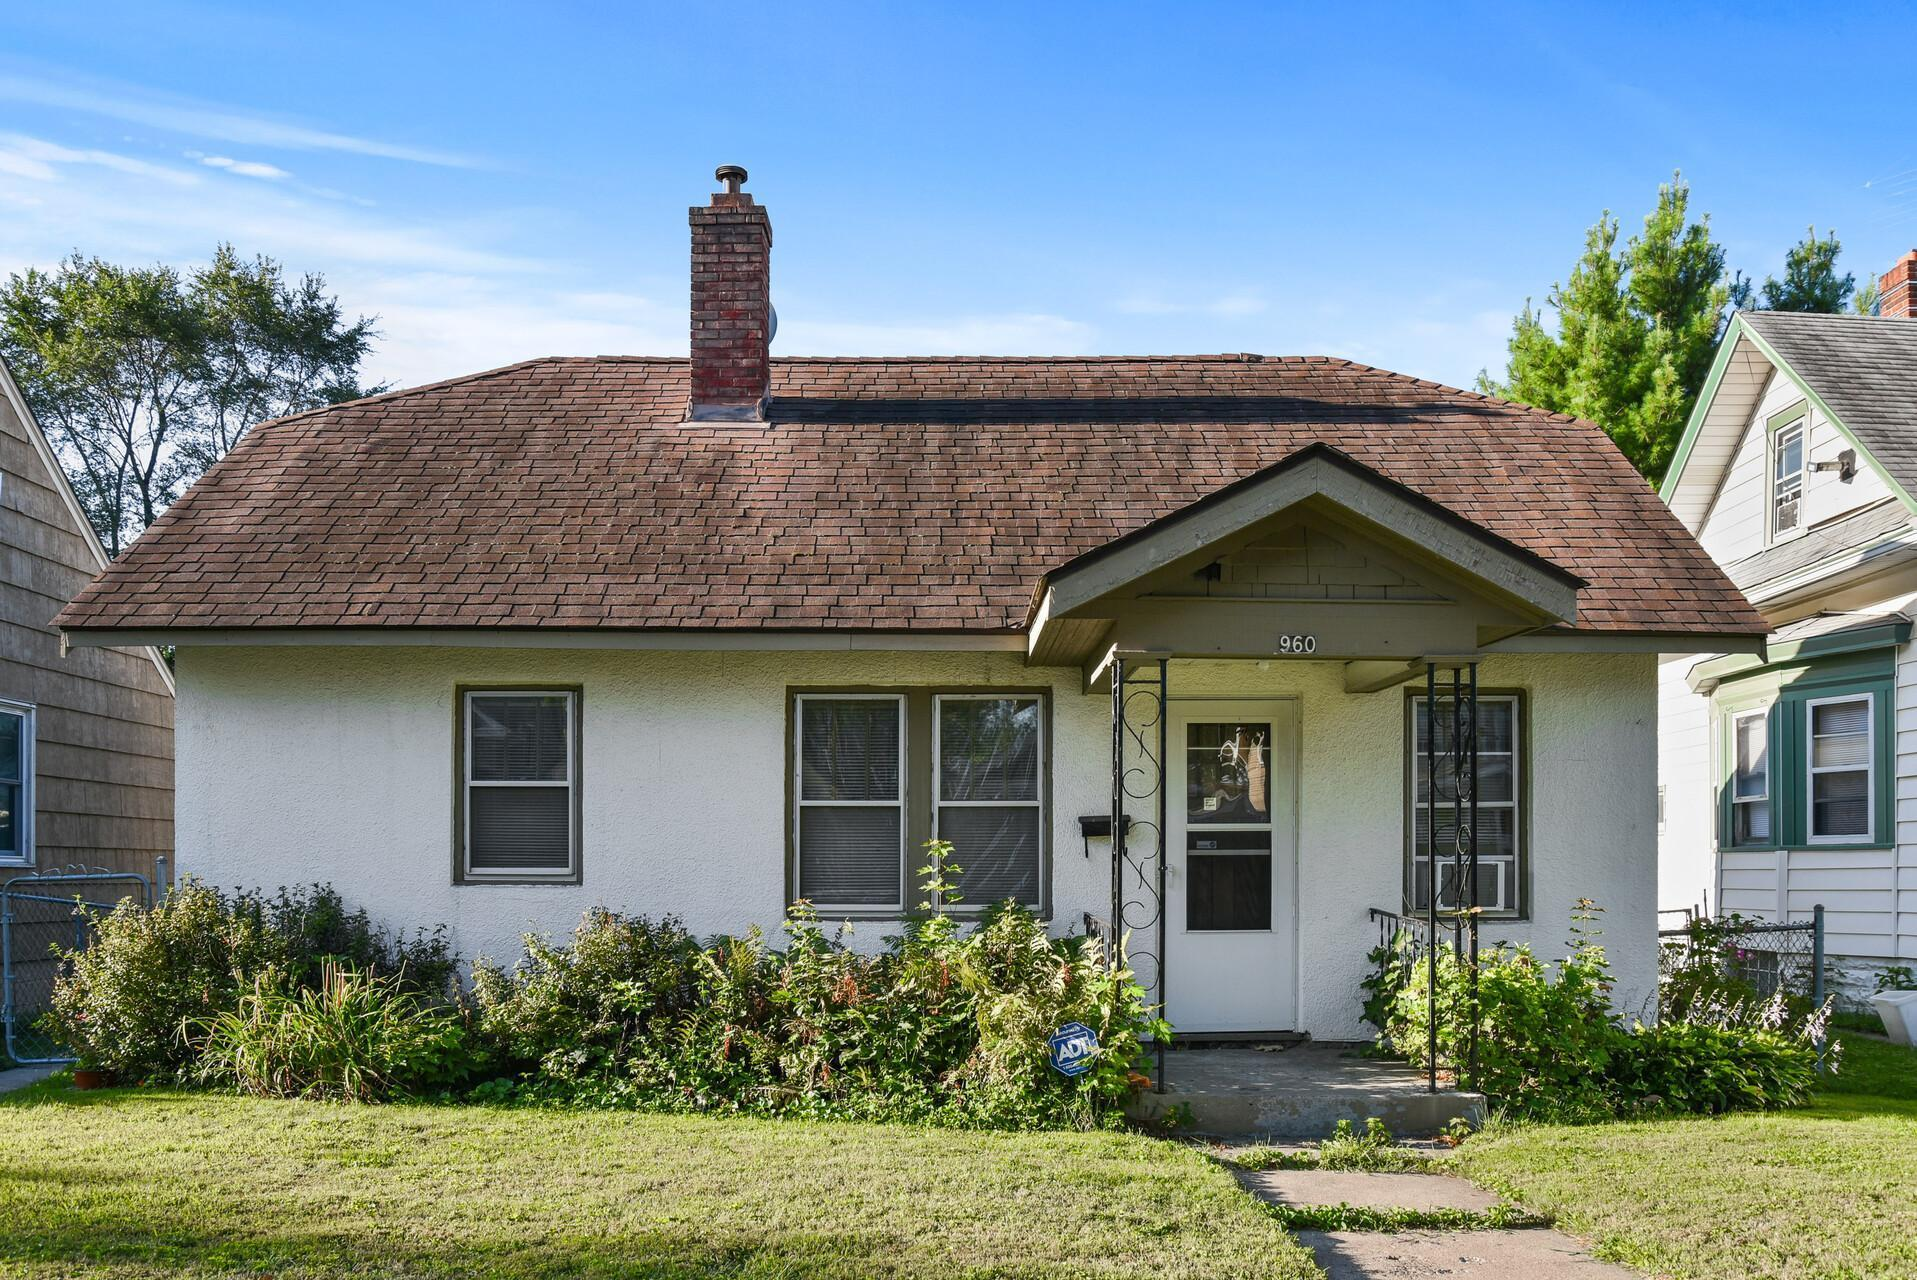 960 Thomas Avenue, Saint Paul, Minnesota 55104, 5 Bedrooms Bedrooms, ,1 BathroomBathrooms,Single Family,For Sale,960 Thomas Avenue,5735378